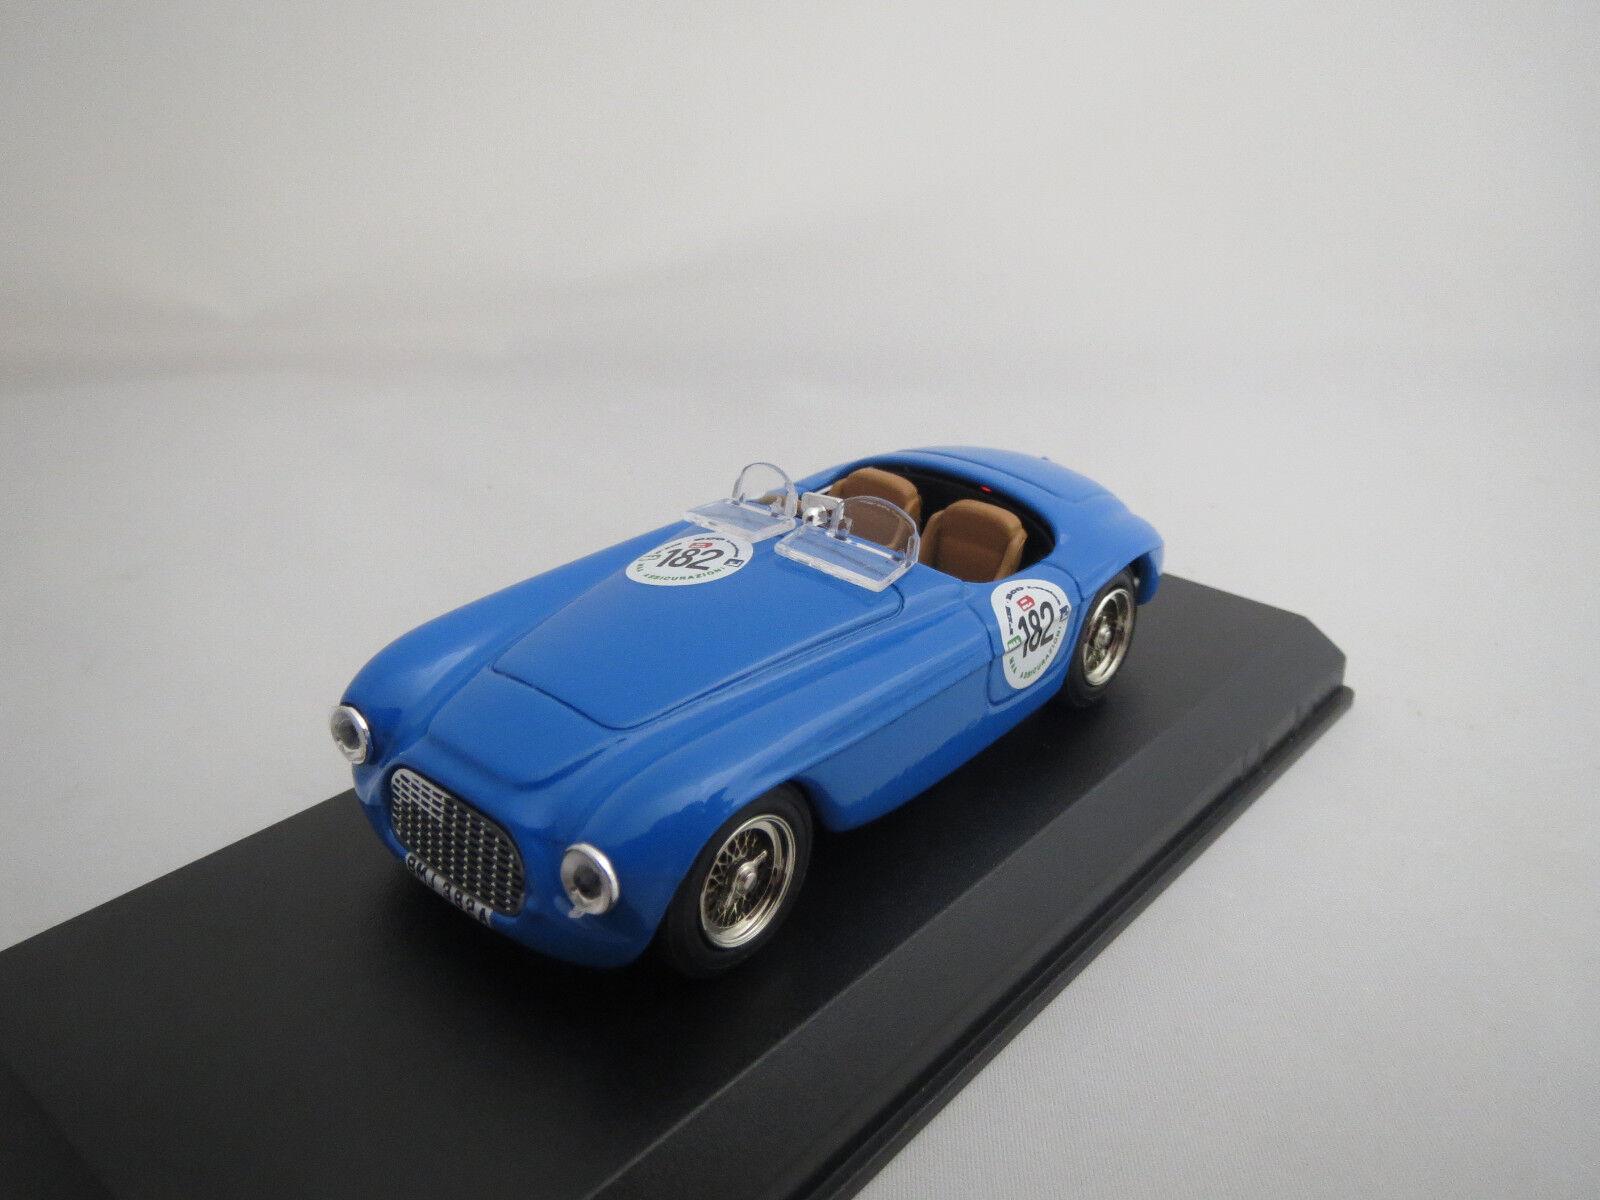 ART Model  Ferrari  166 MM  Mille  Miglia   1991   (blue)  1 43  OVP